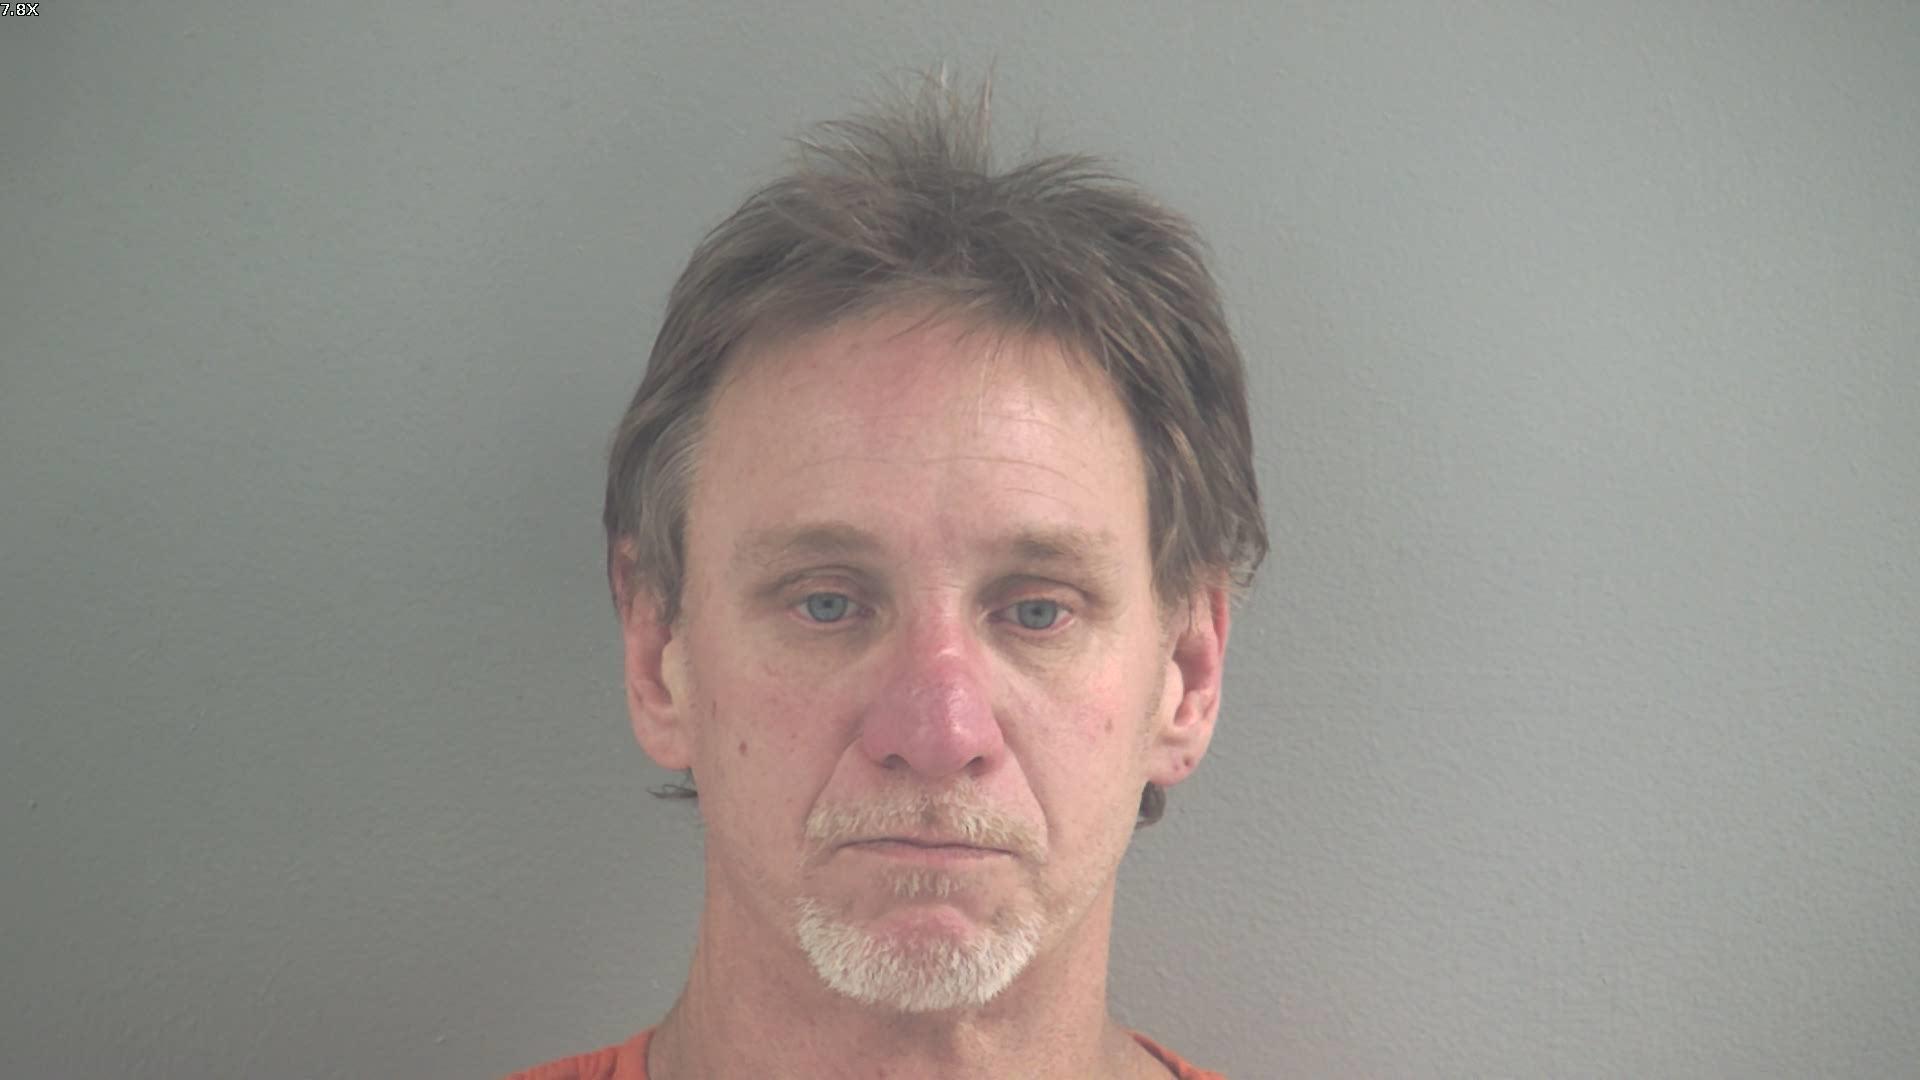 Adairville man arrested on meth, marijuana charges